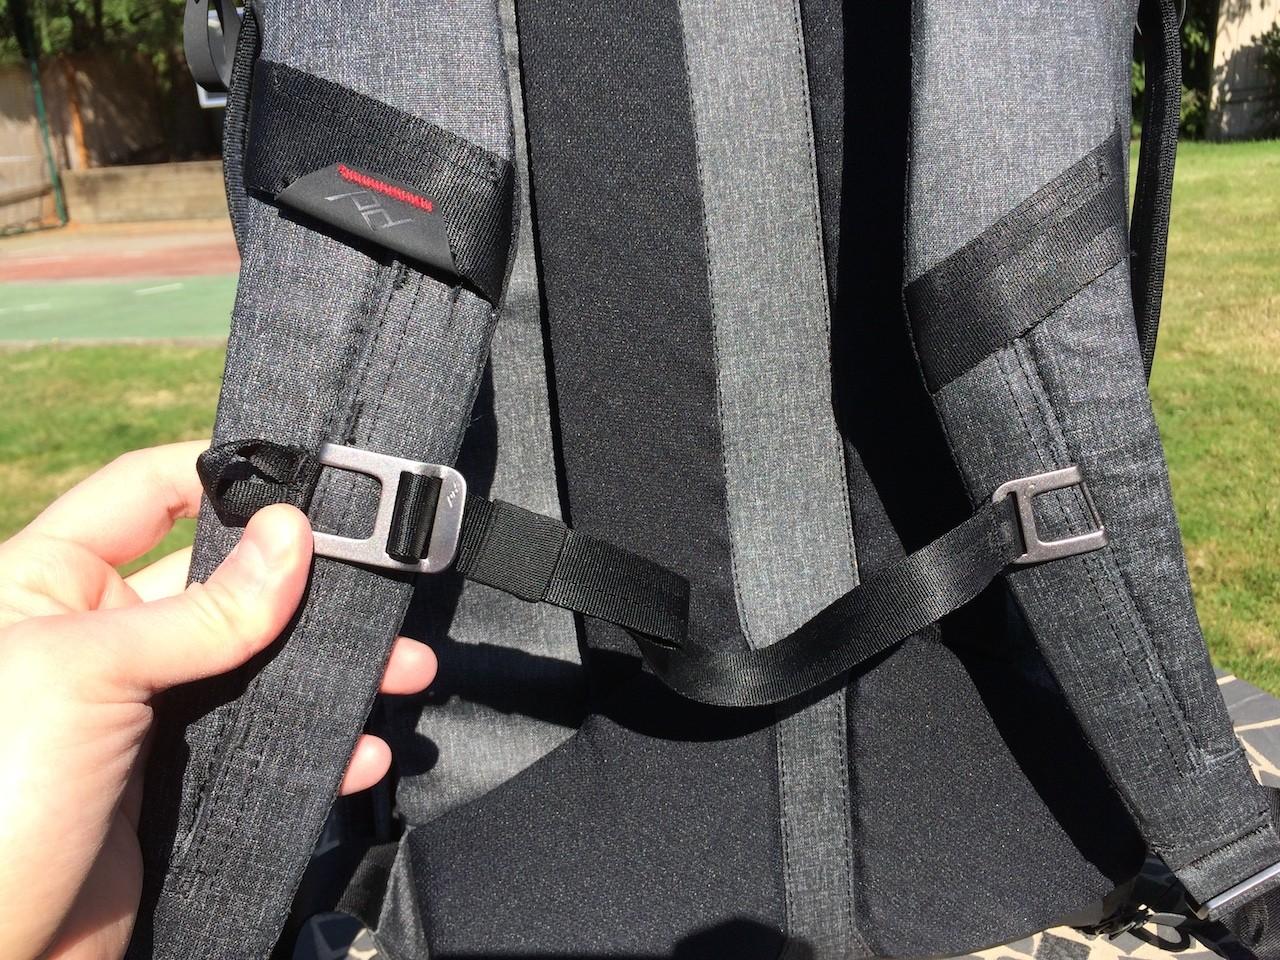 Peak Design Everyday Backpack sternum strap